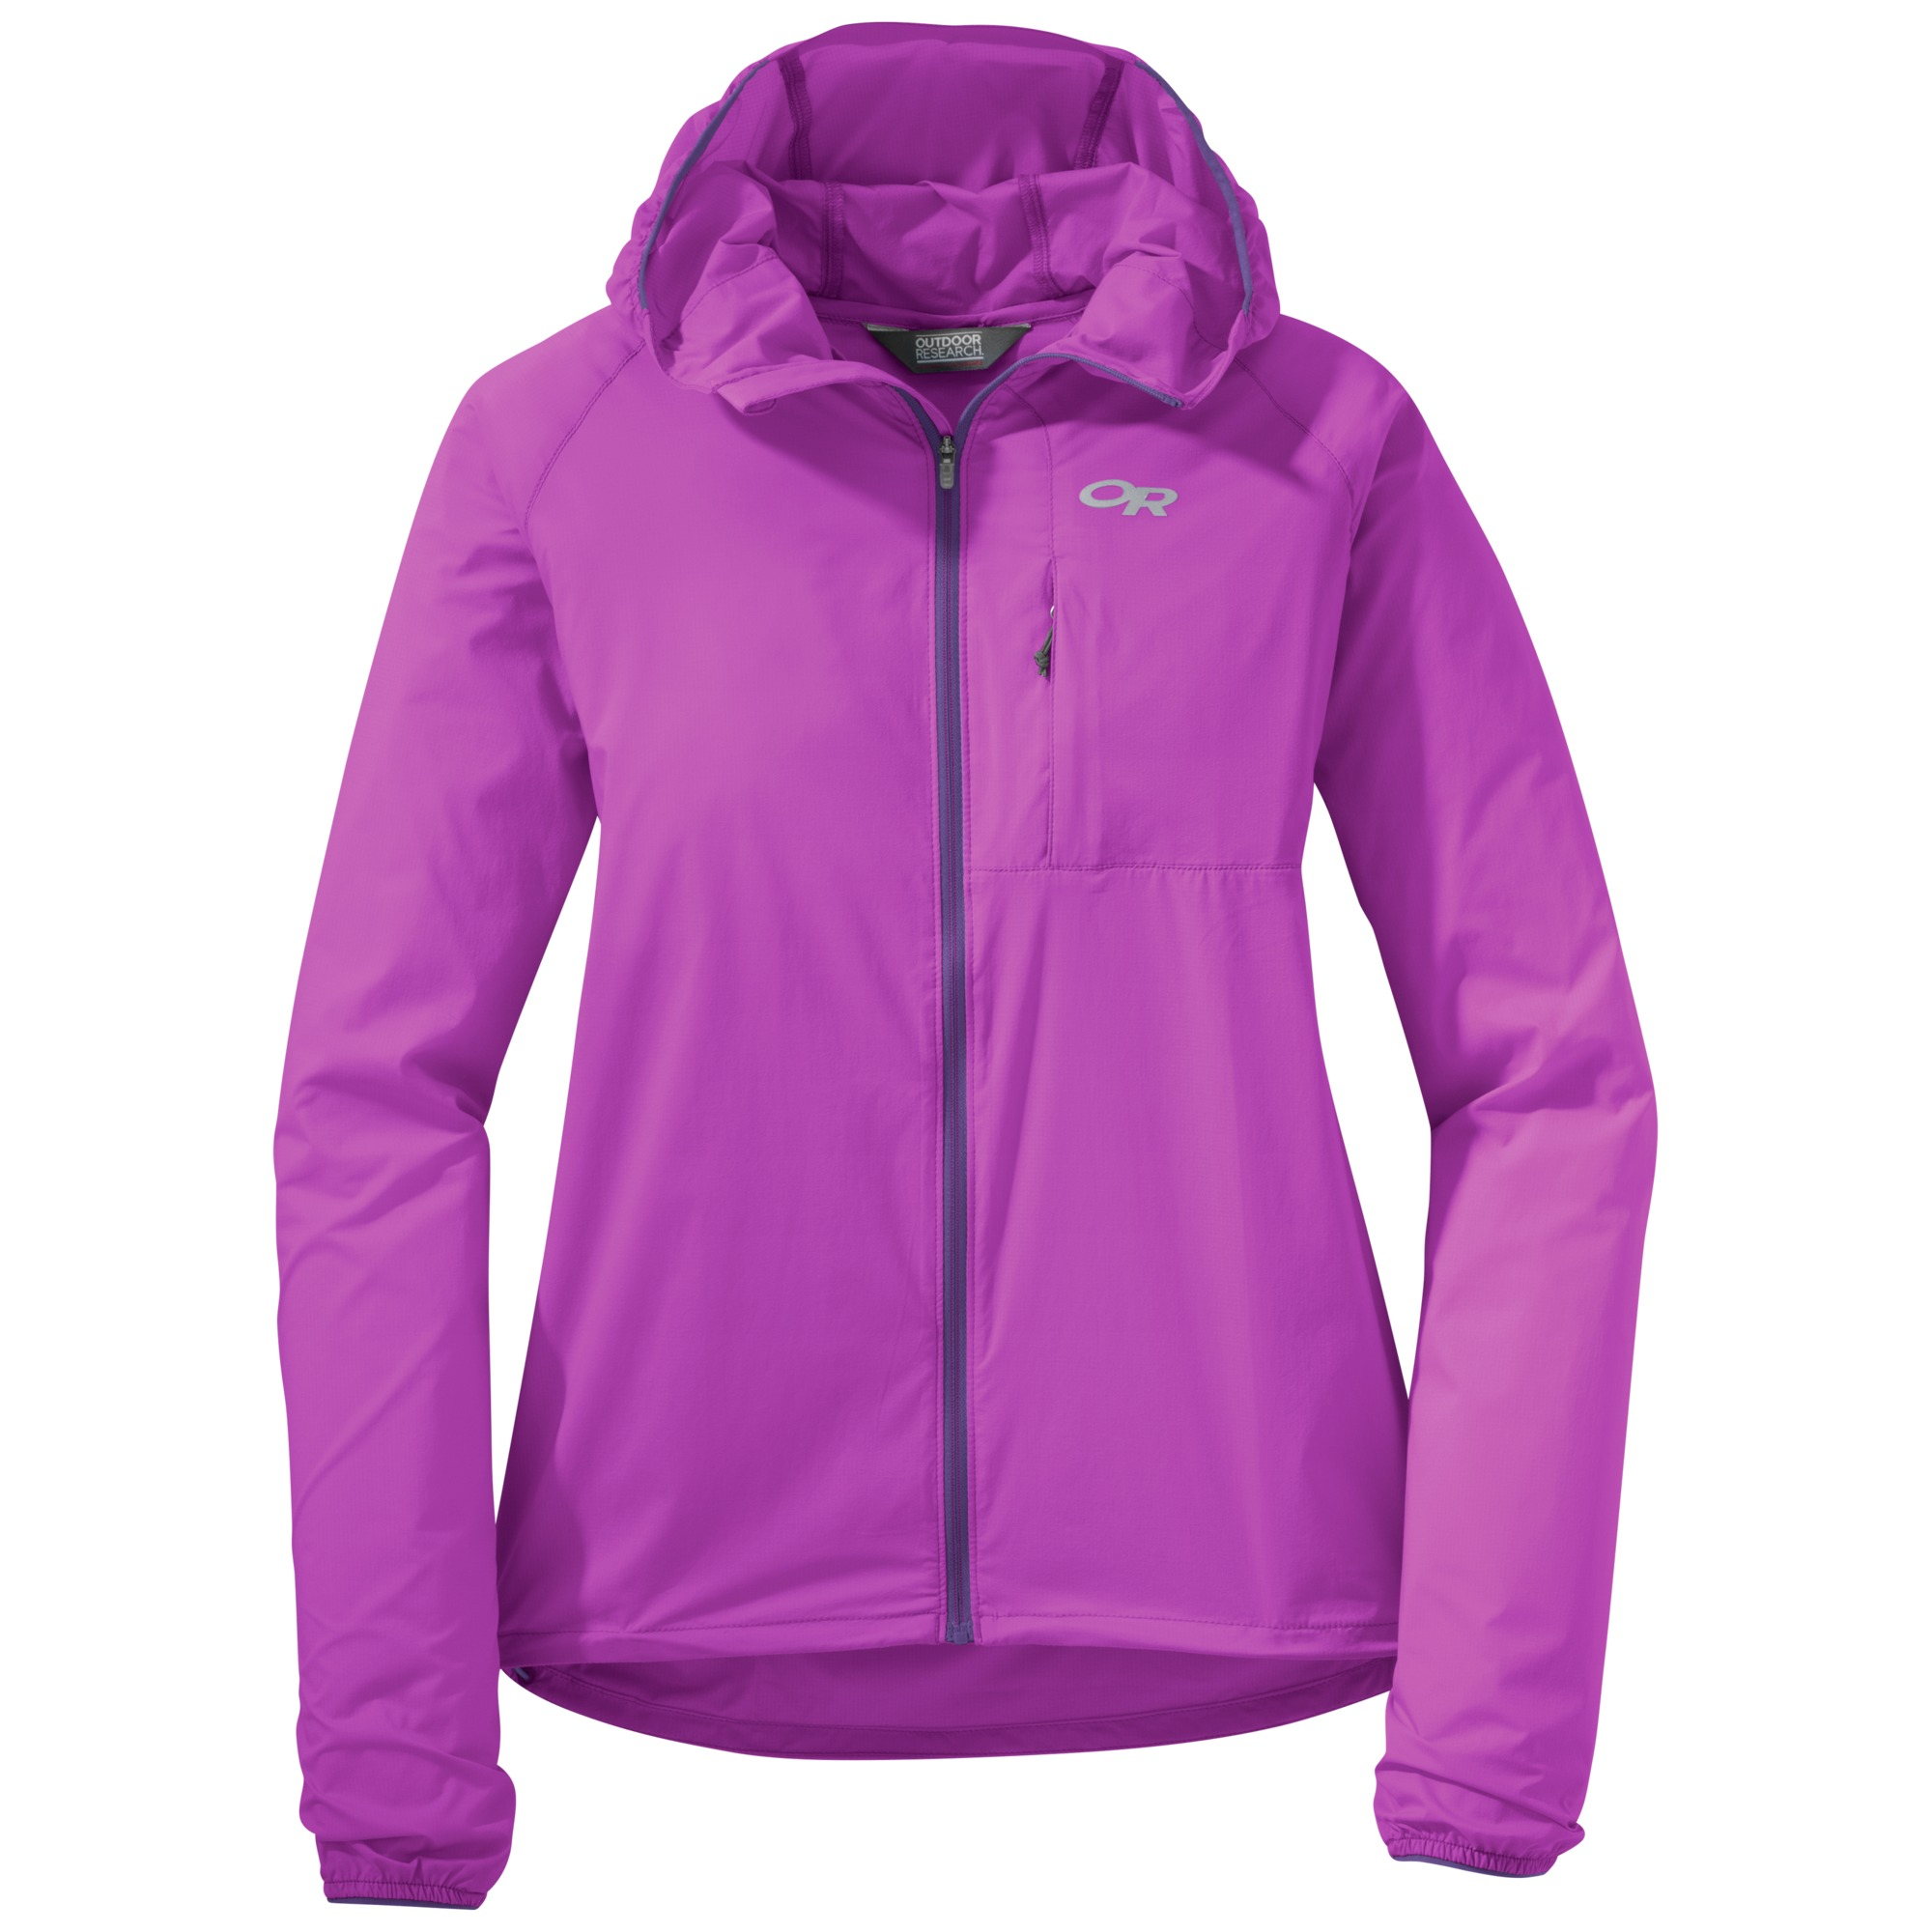 Outdoor Research Women's Tantrum II Hooded Jacket-ultraviolet/purple rain-S - Gr